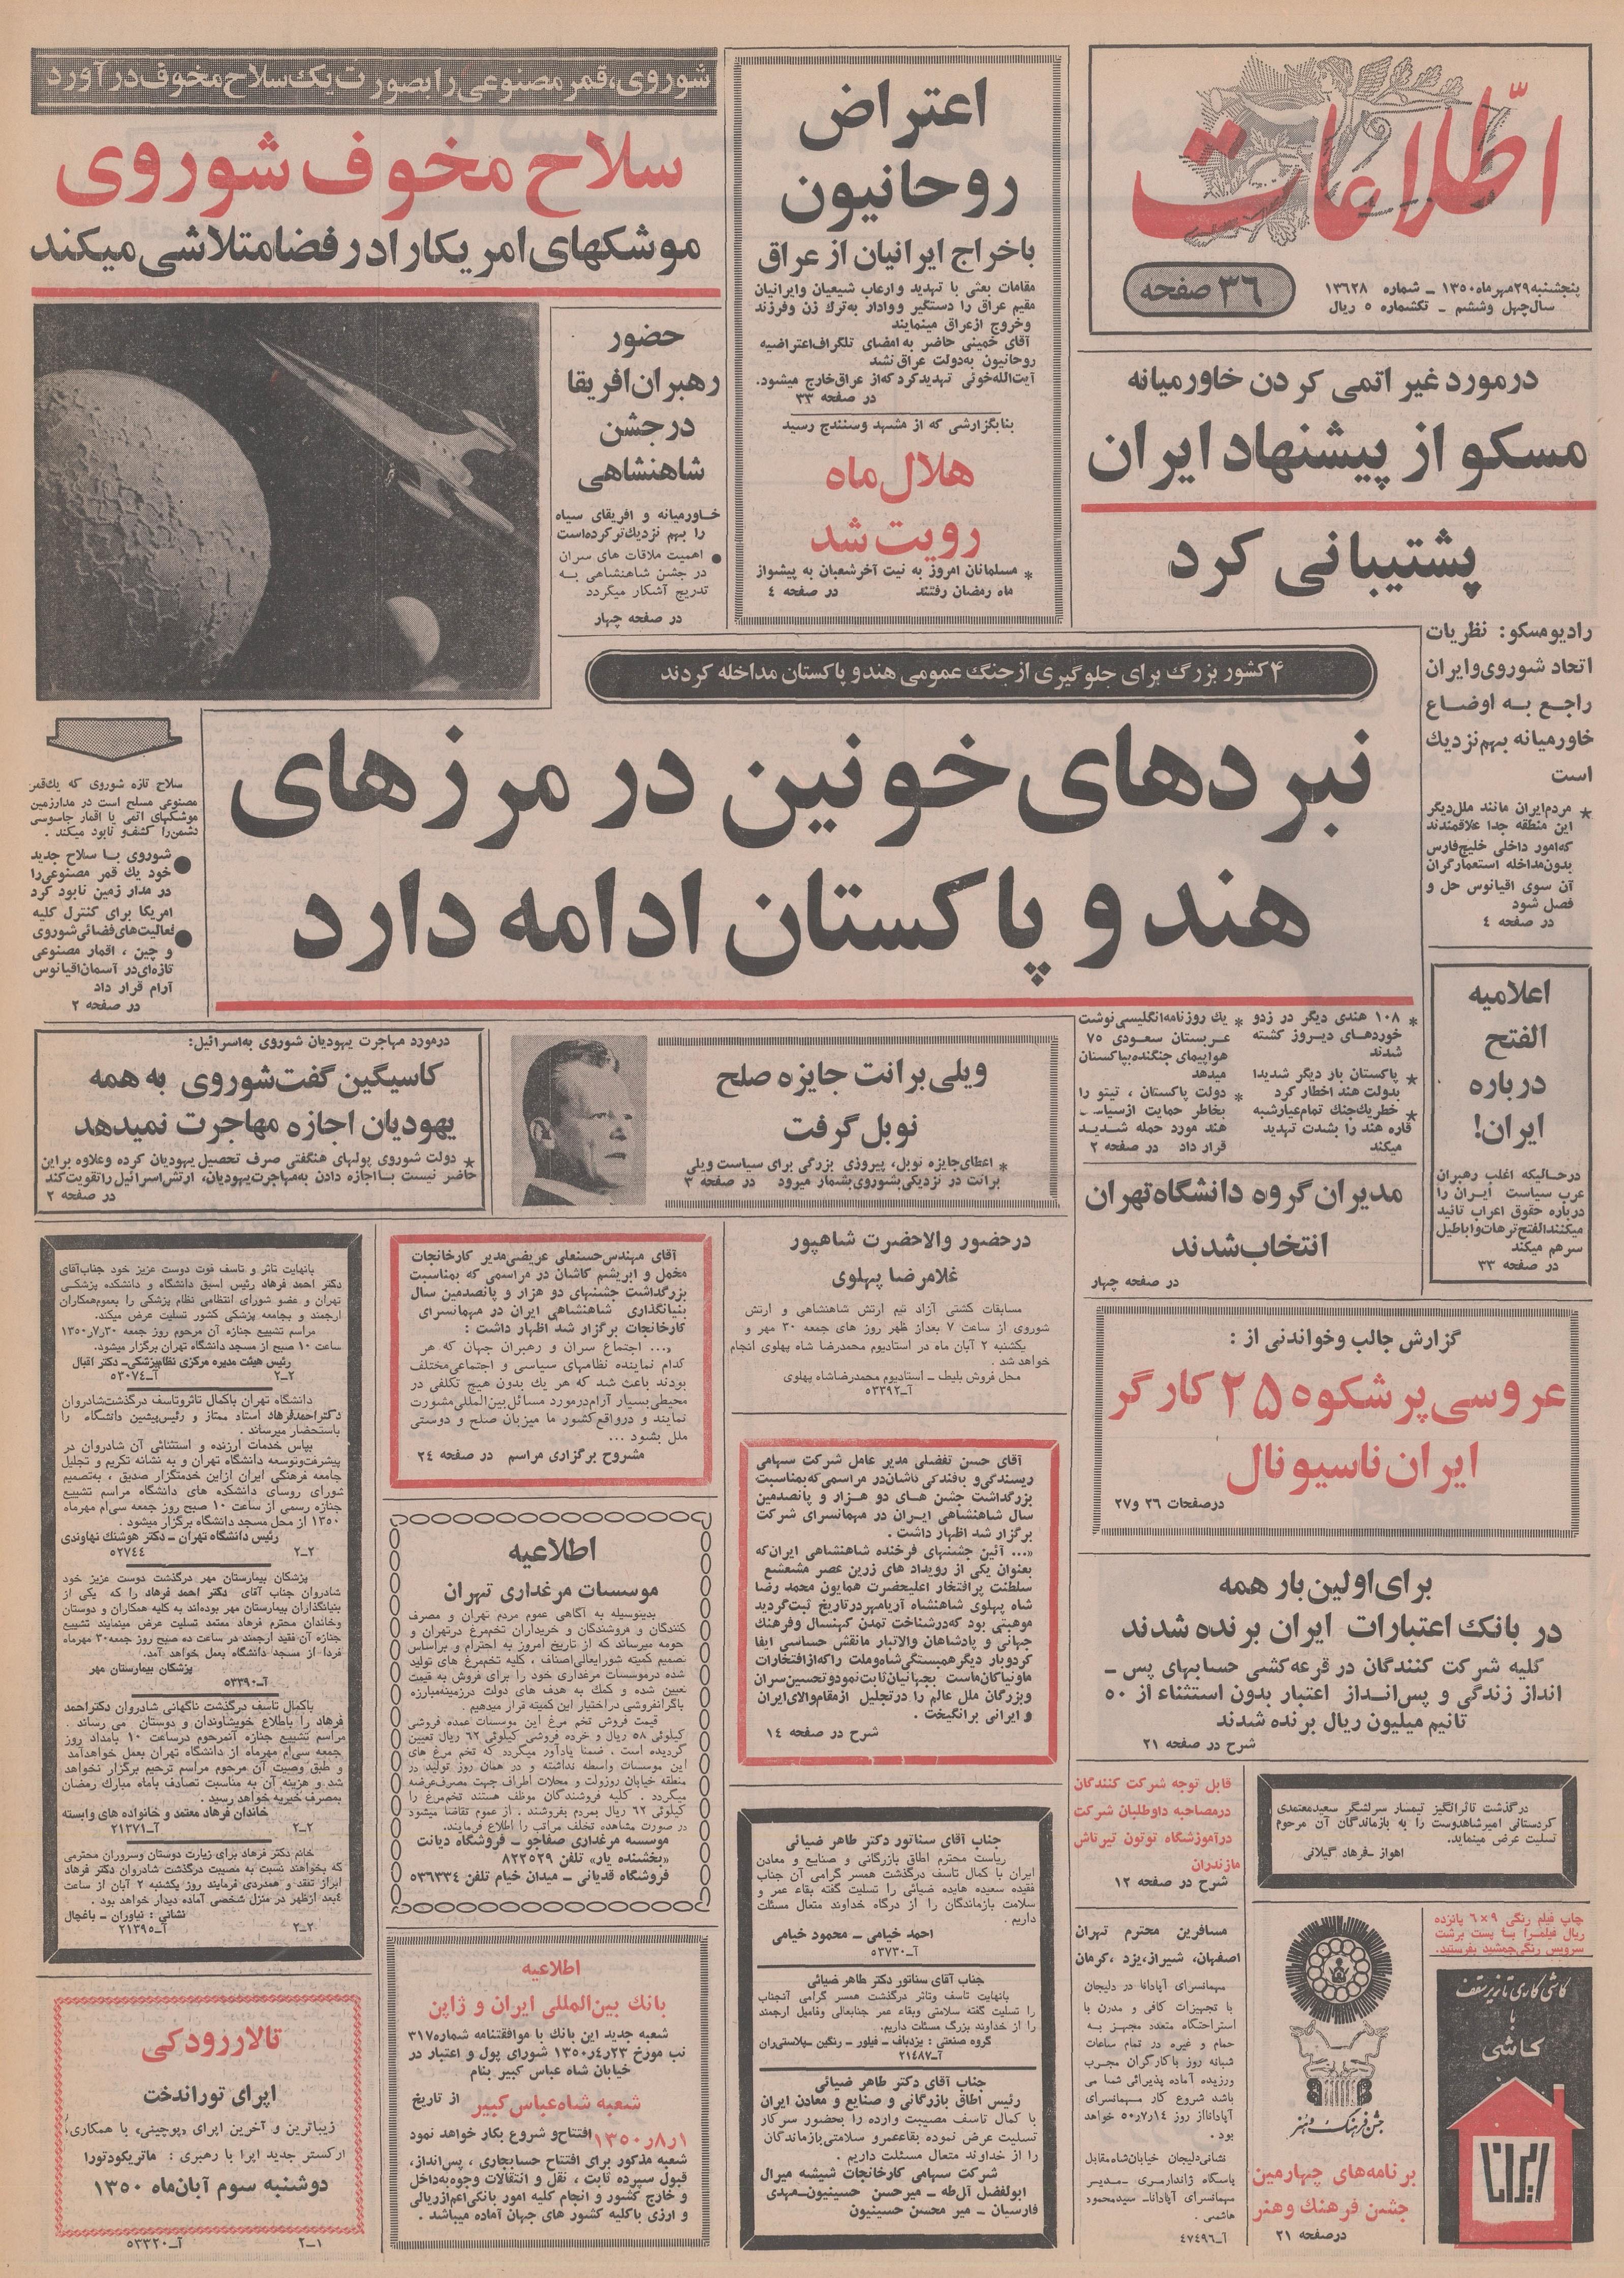 اطلاعات 29 مهر 1350